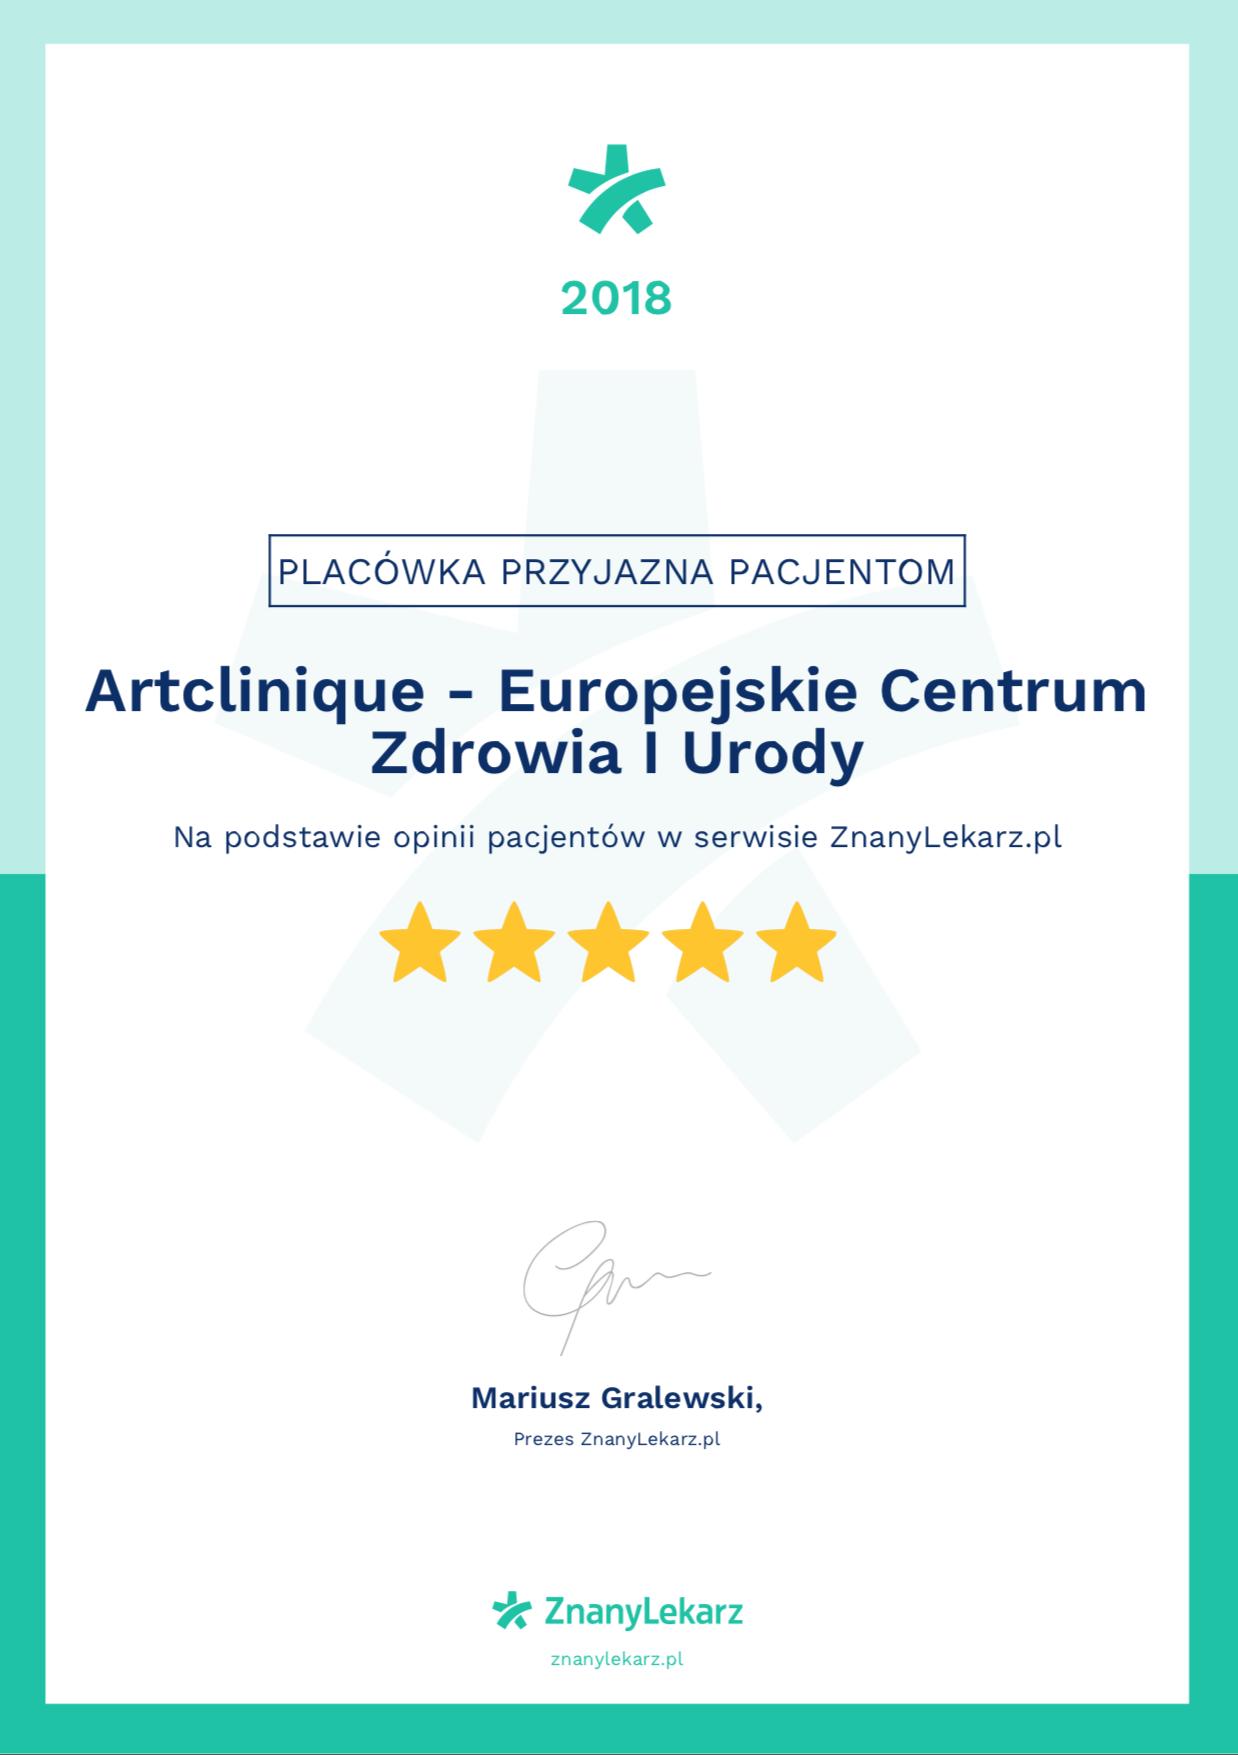 certyfikat znany lekarz ArtClinique